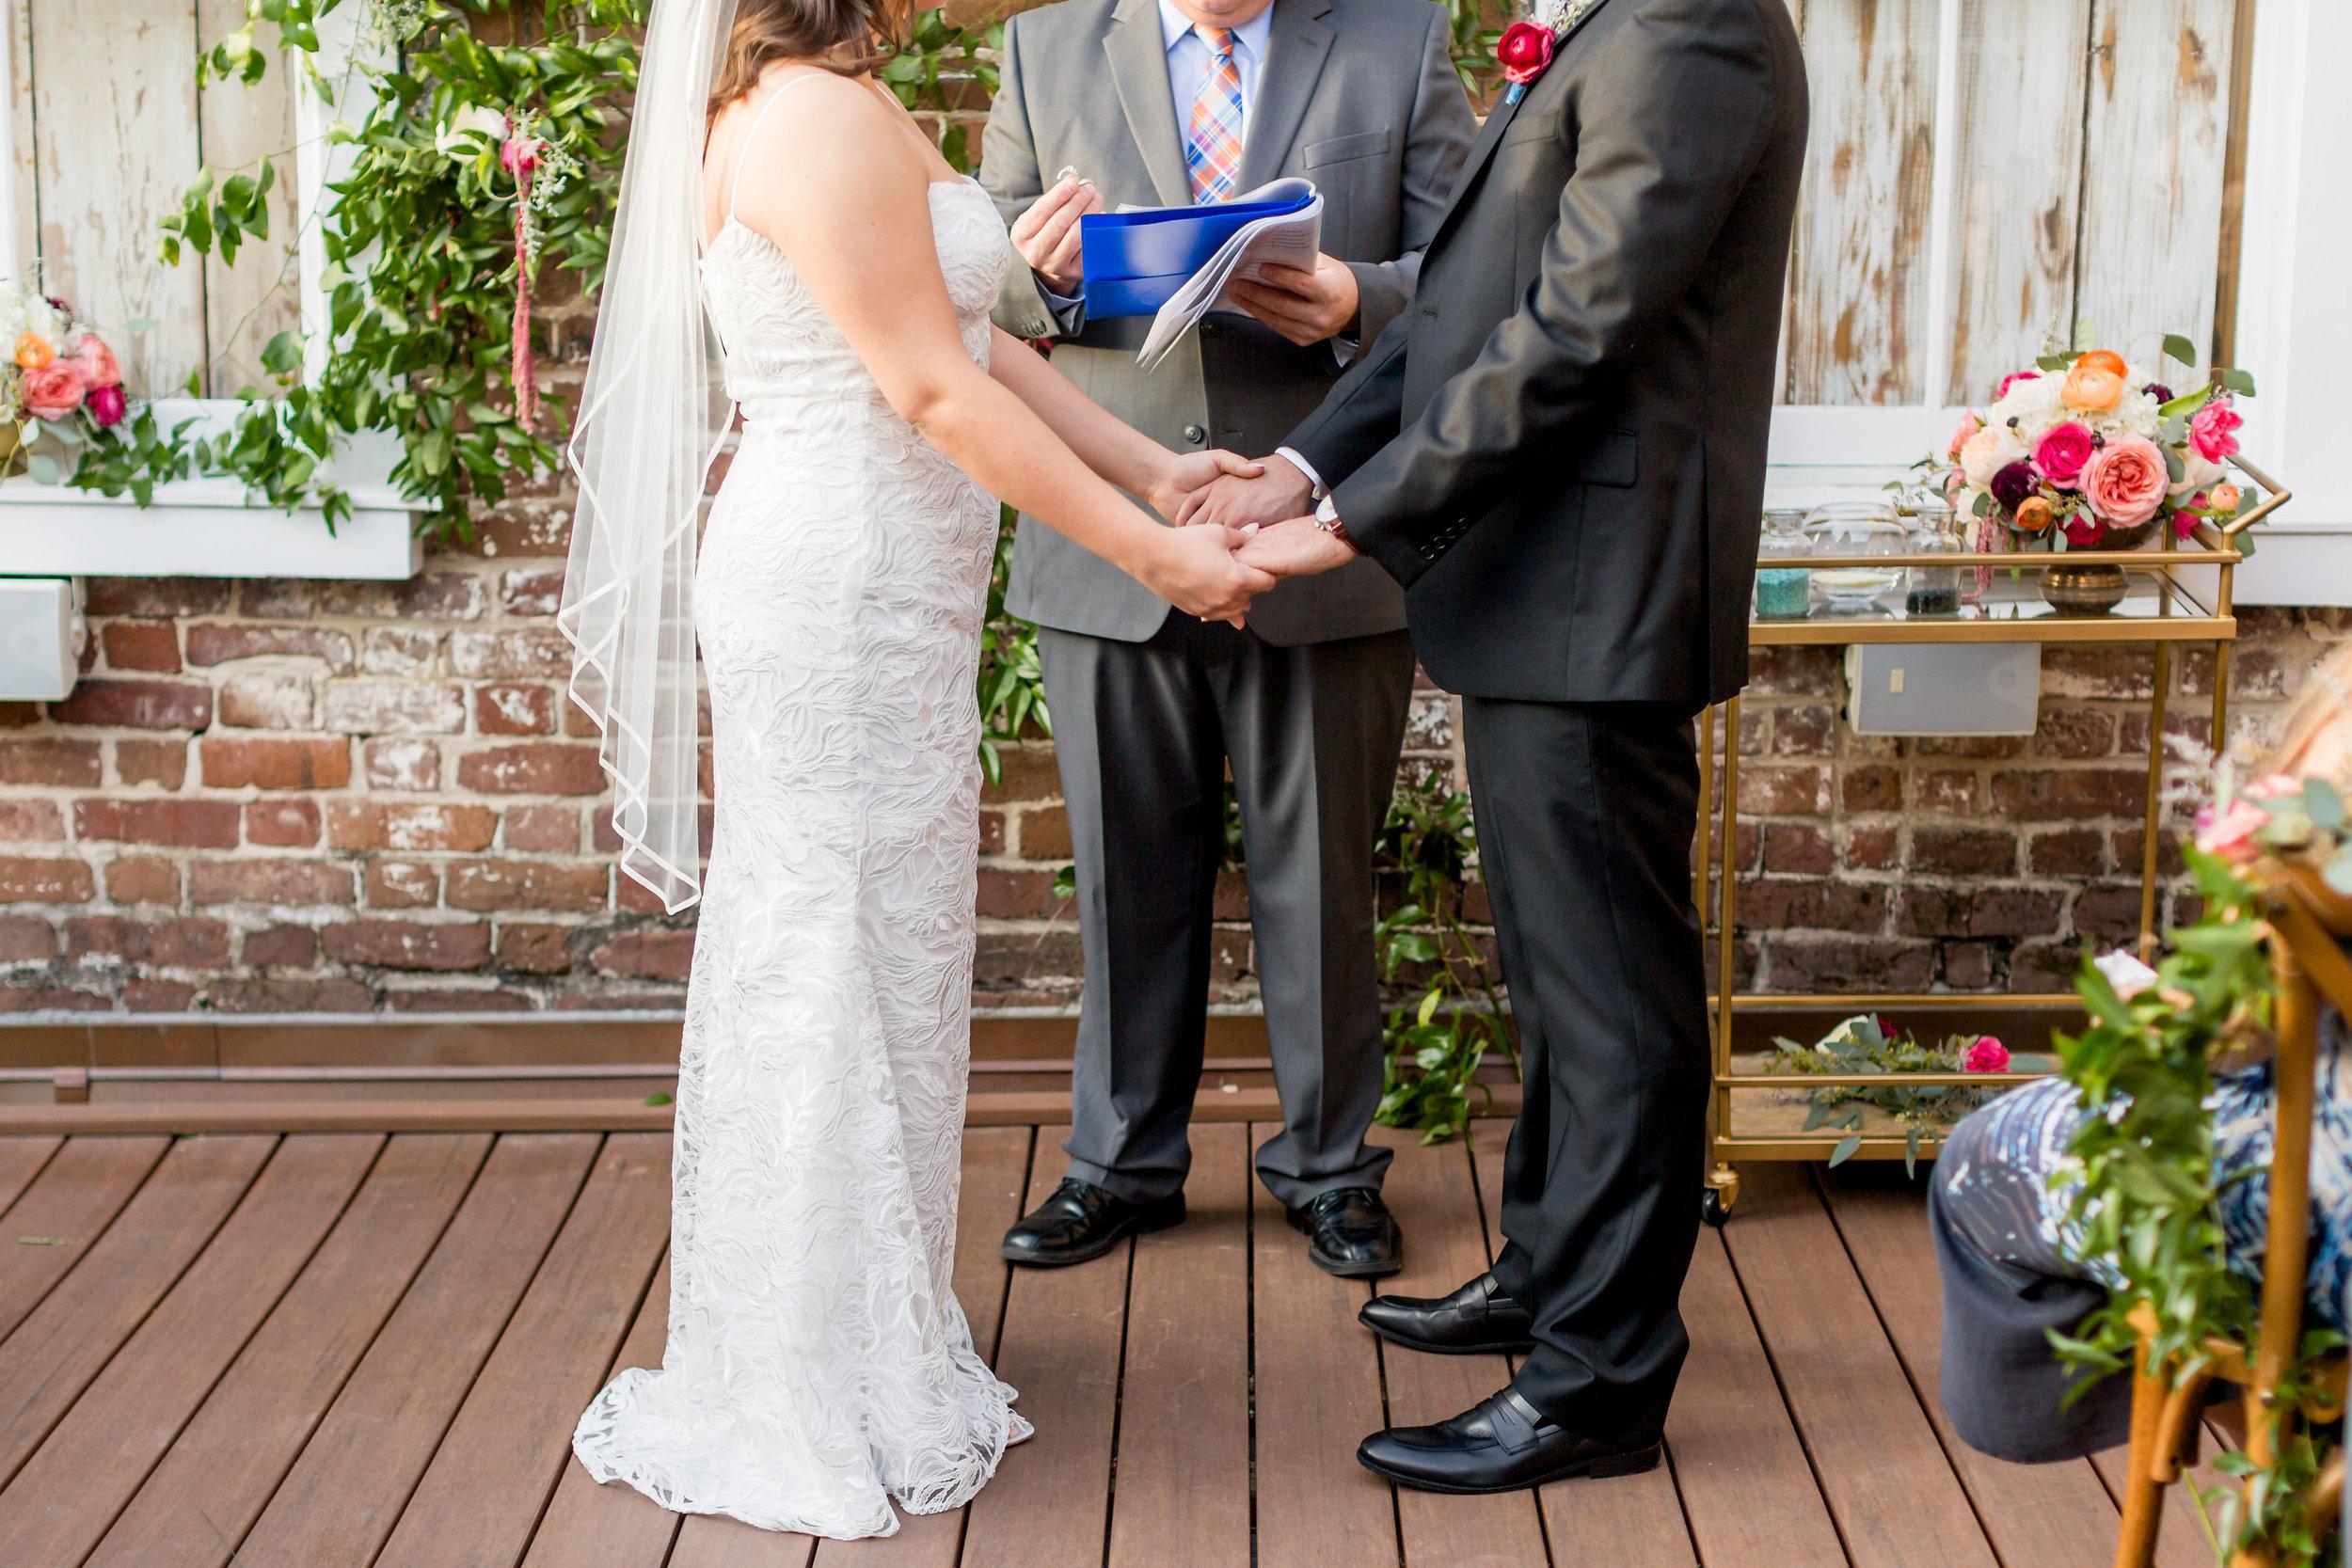 charleston new years elopement popup surprise wedding at upstairs at midtown - scarlet plan & design wedding planners (49).jpg